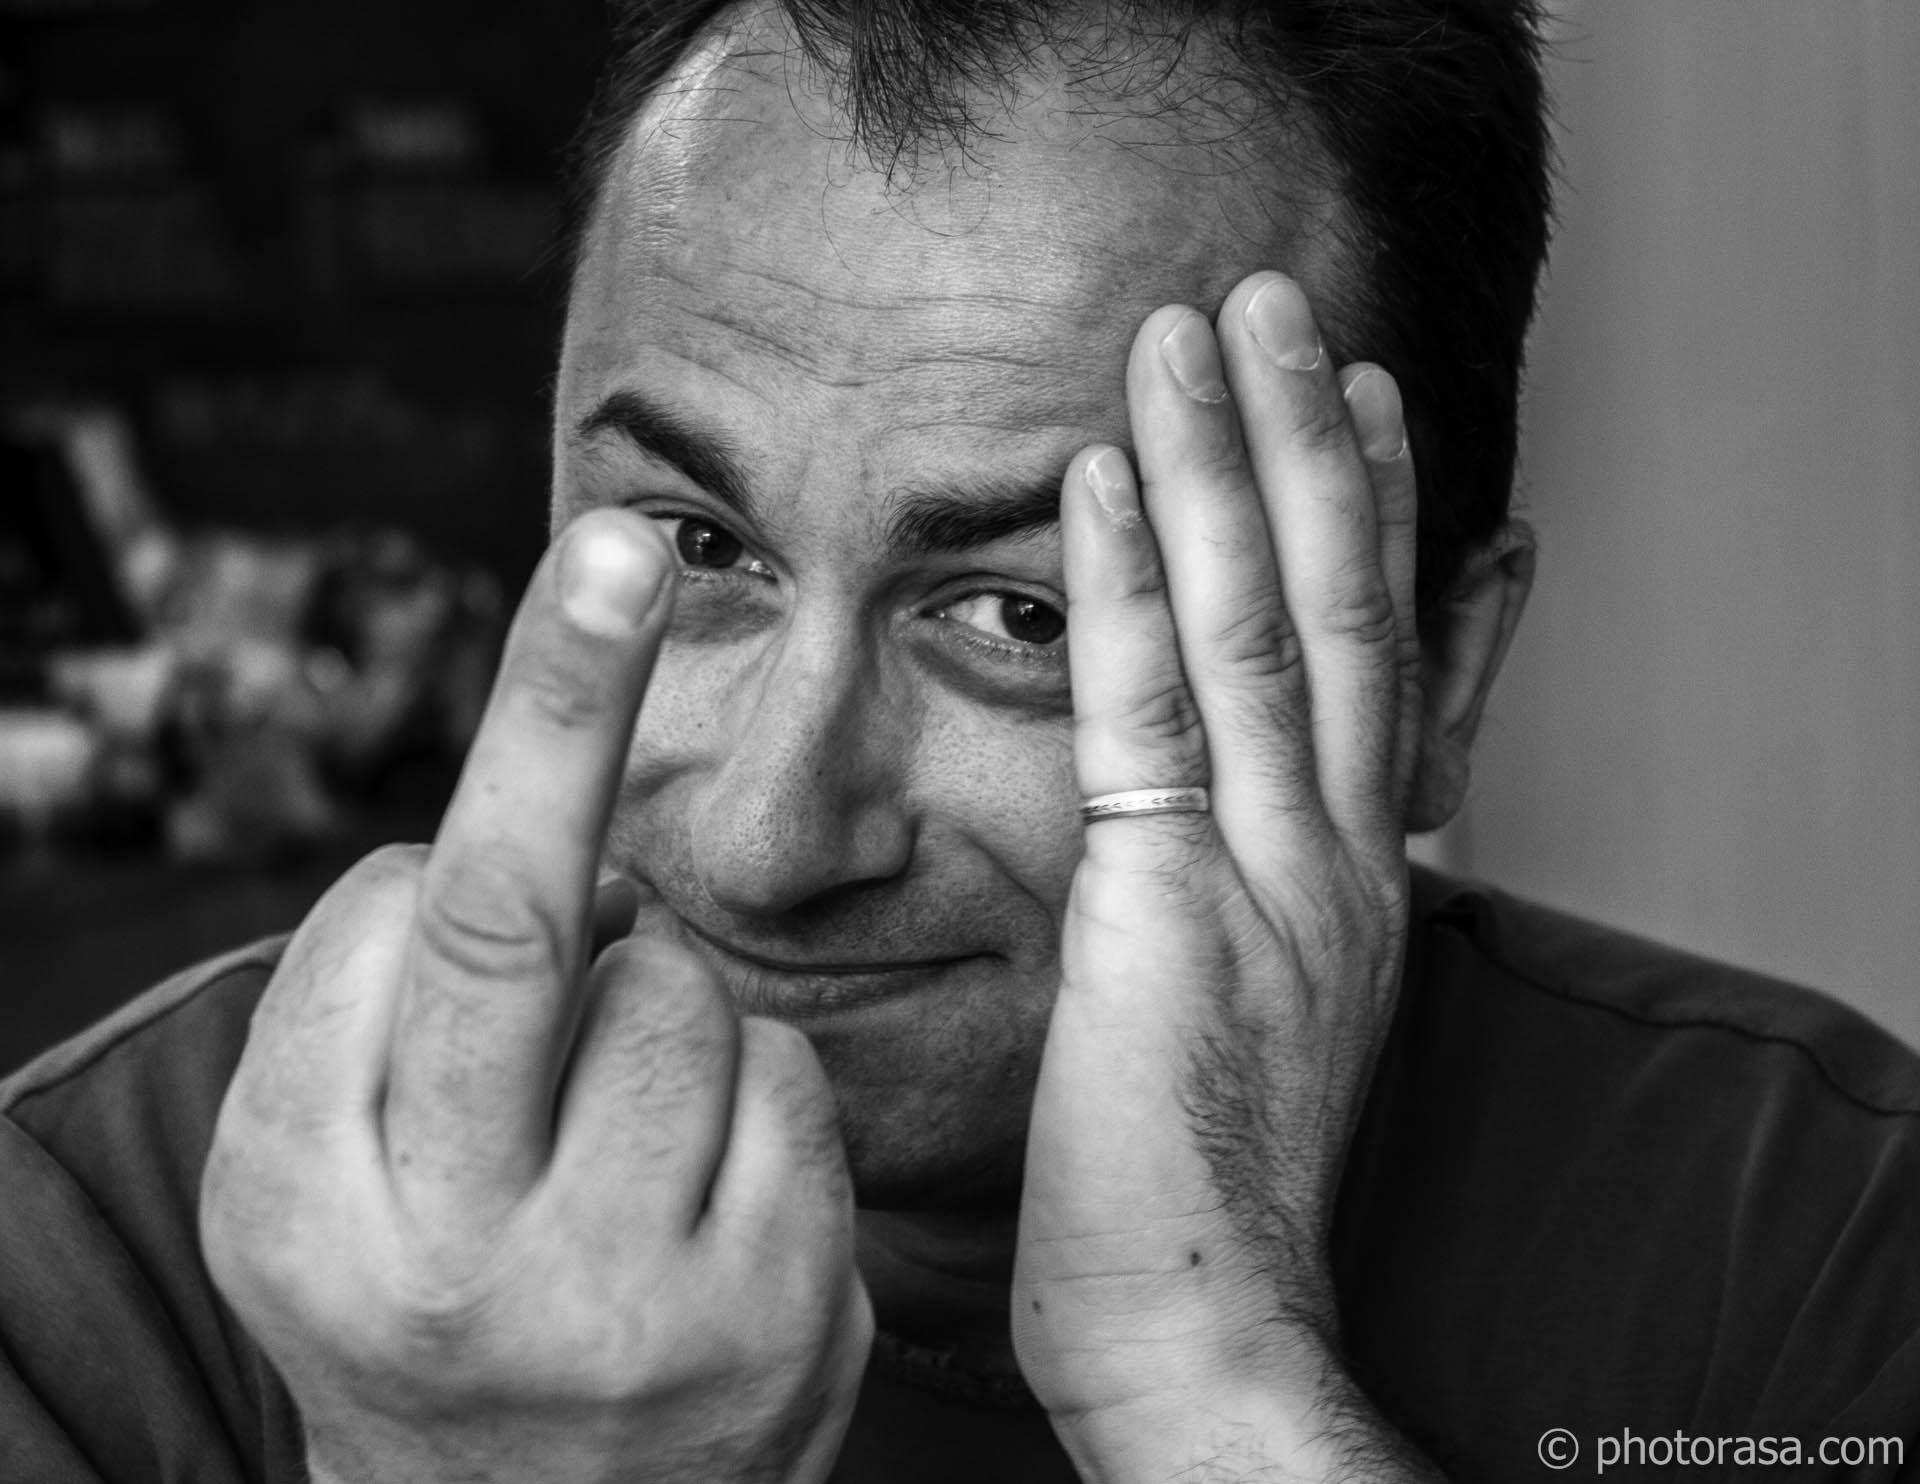 https://photorasa.com/joe/the-finger/